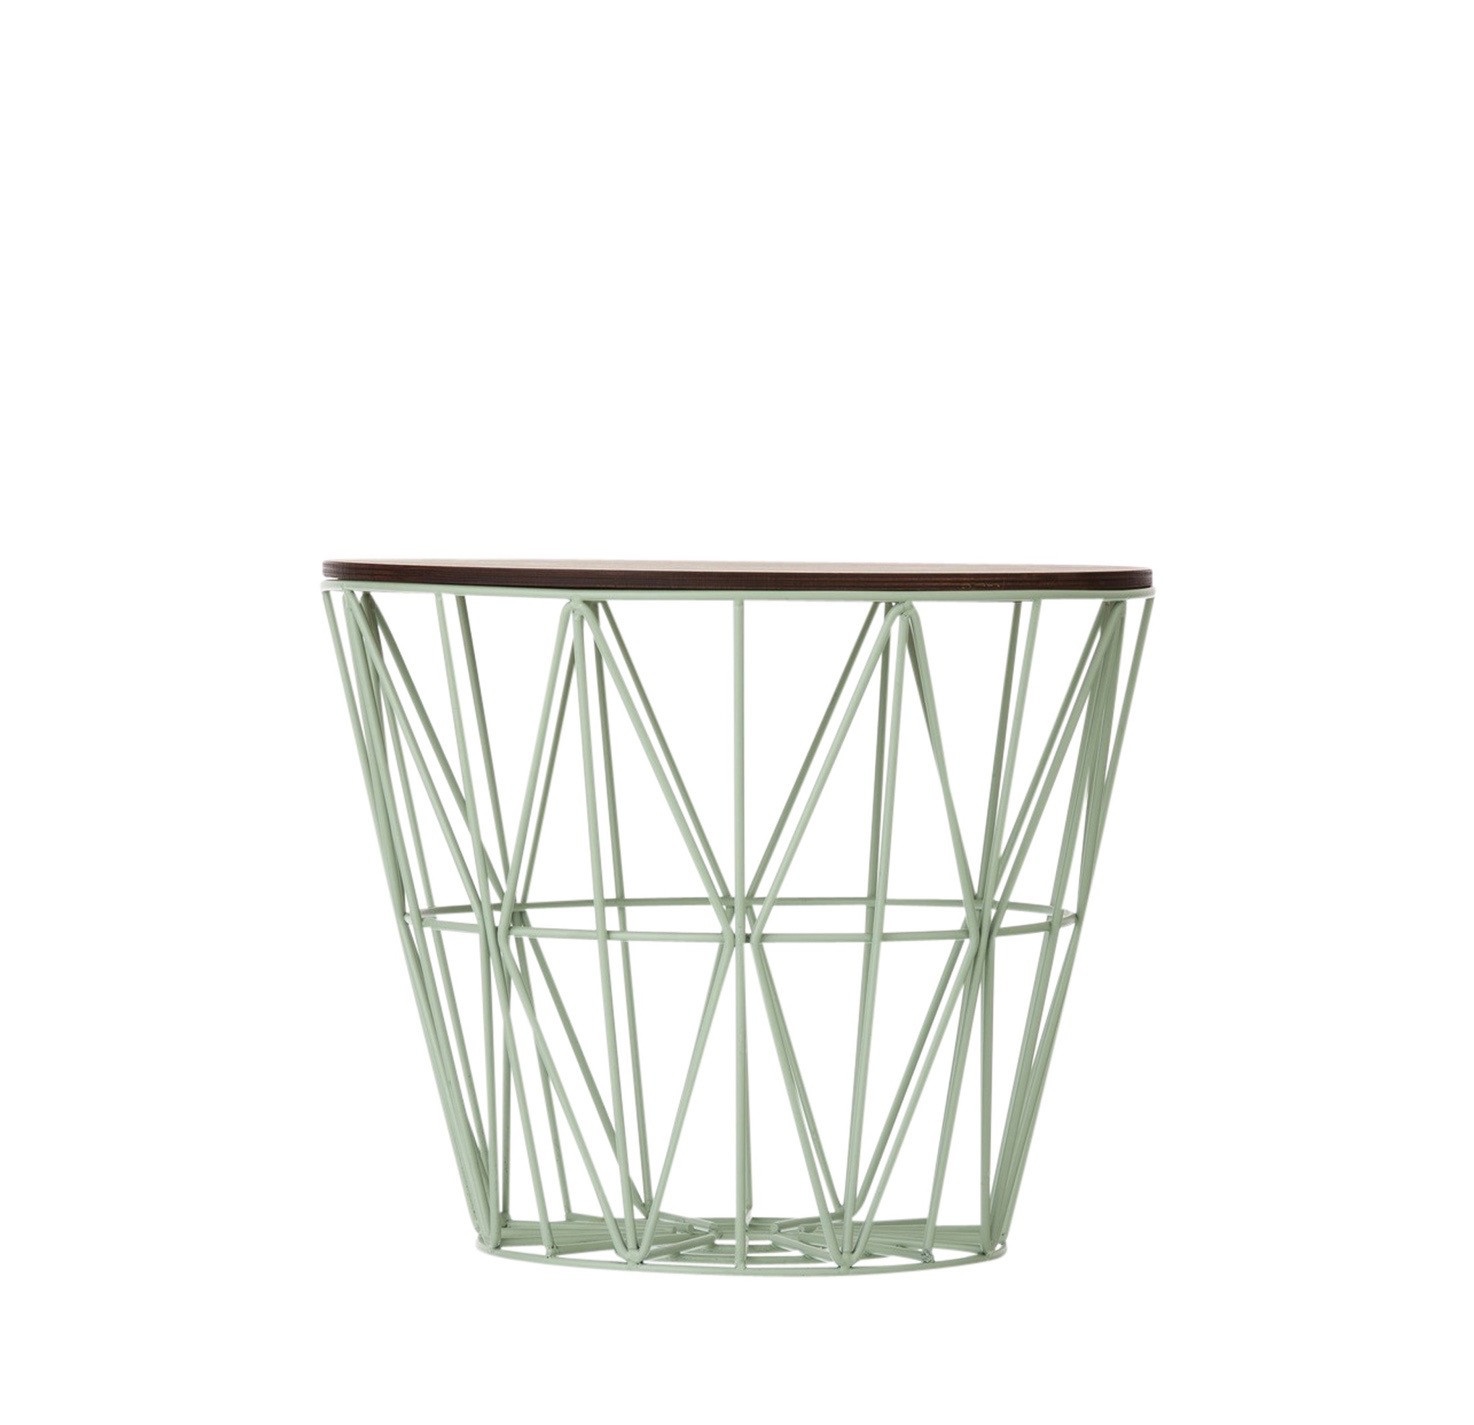 ferm living wire basket table small munt. Black Bedroom Furniture Sets. Home Design Ideas